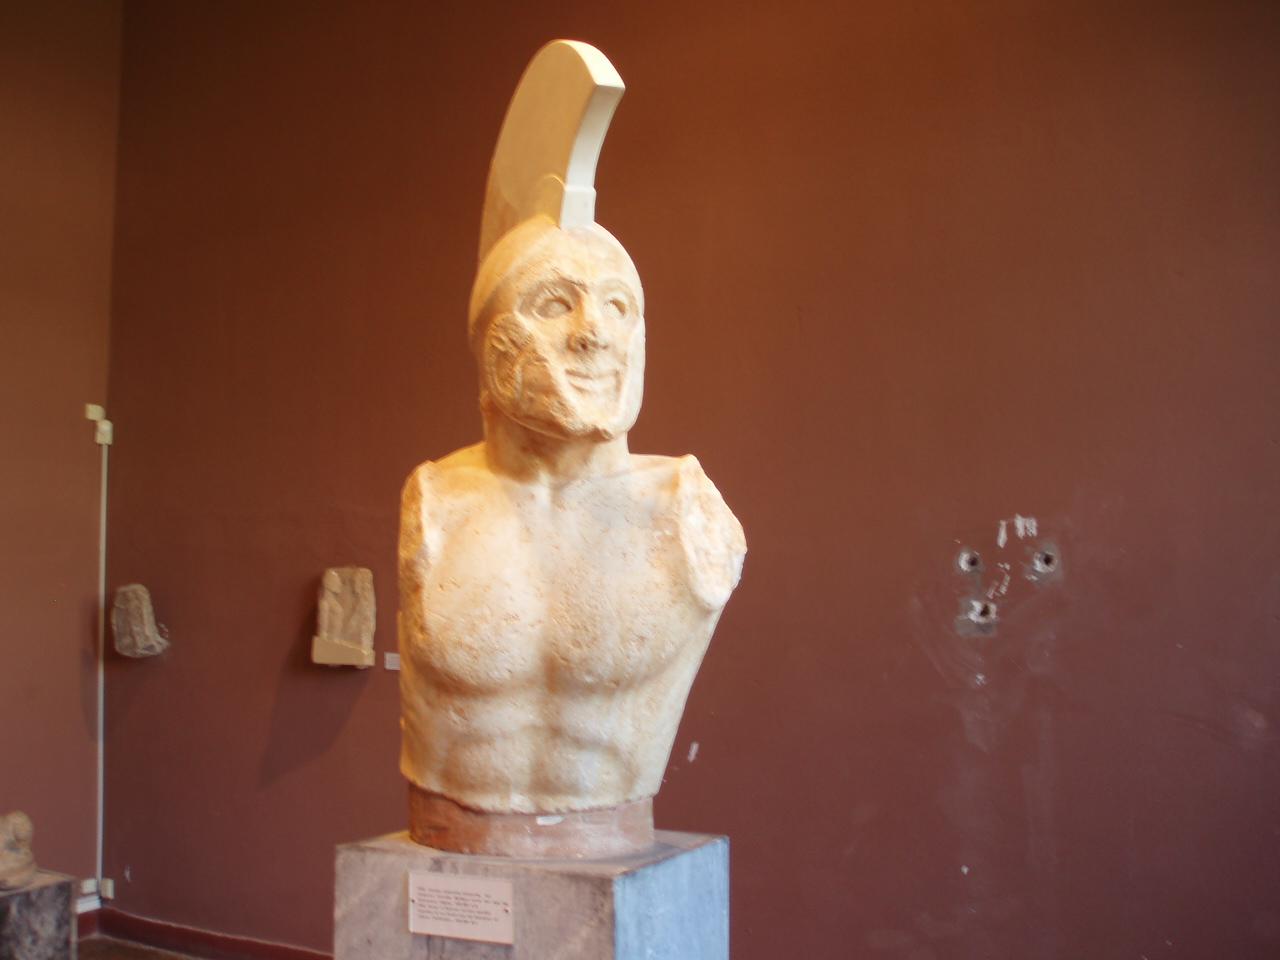 File:Bust of Leonidas I.jpg